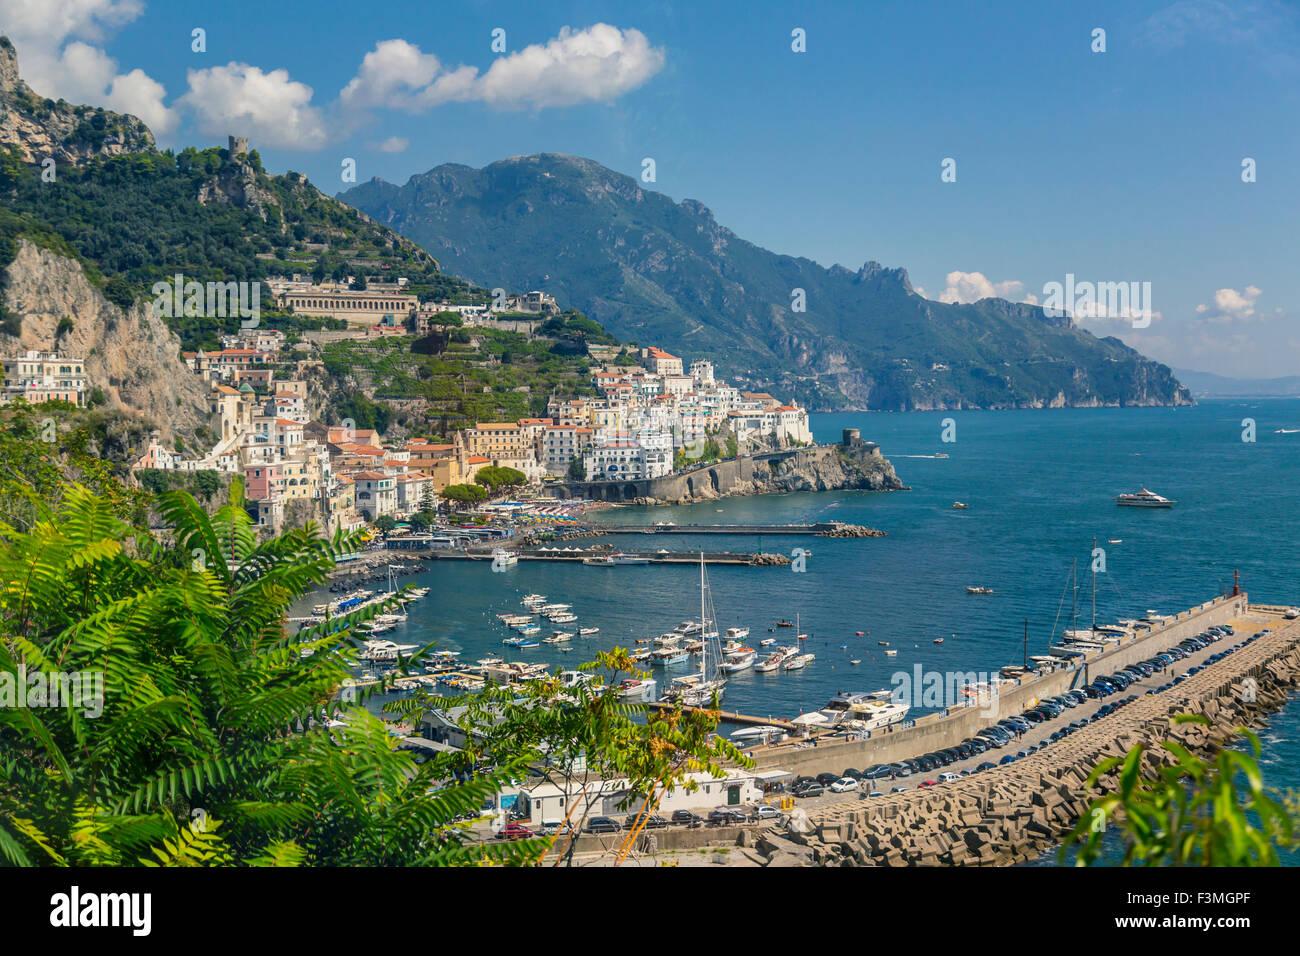 Harbor,Italy,Resort,Mountain,Amalfi Coast - Stock Image